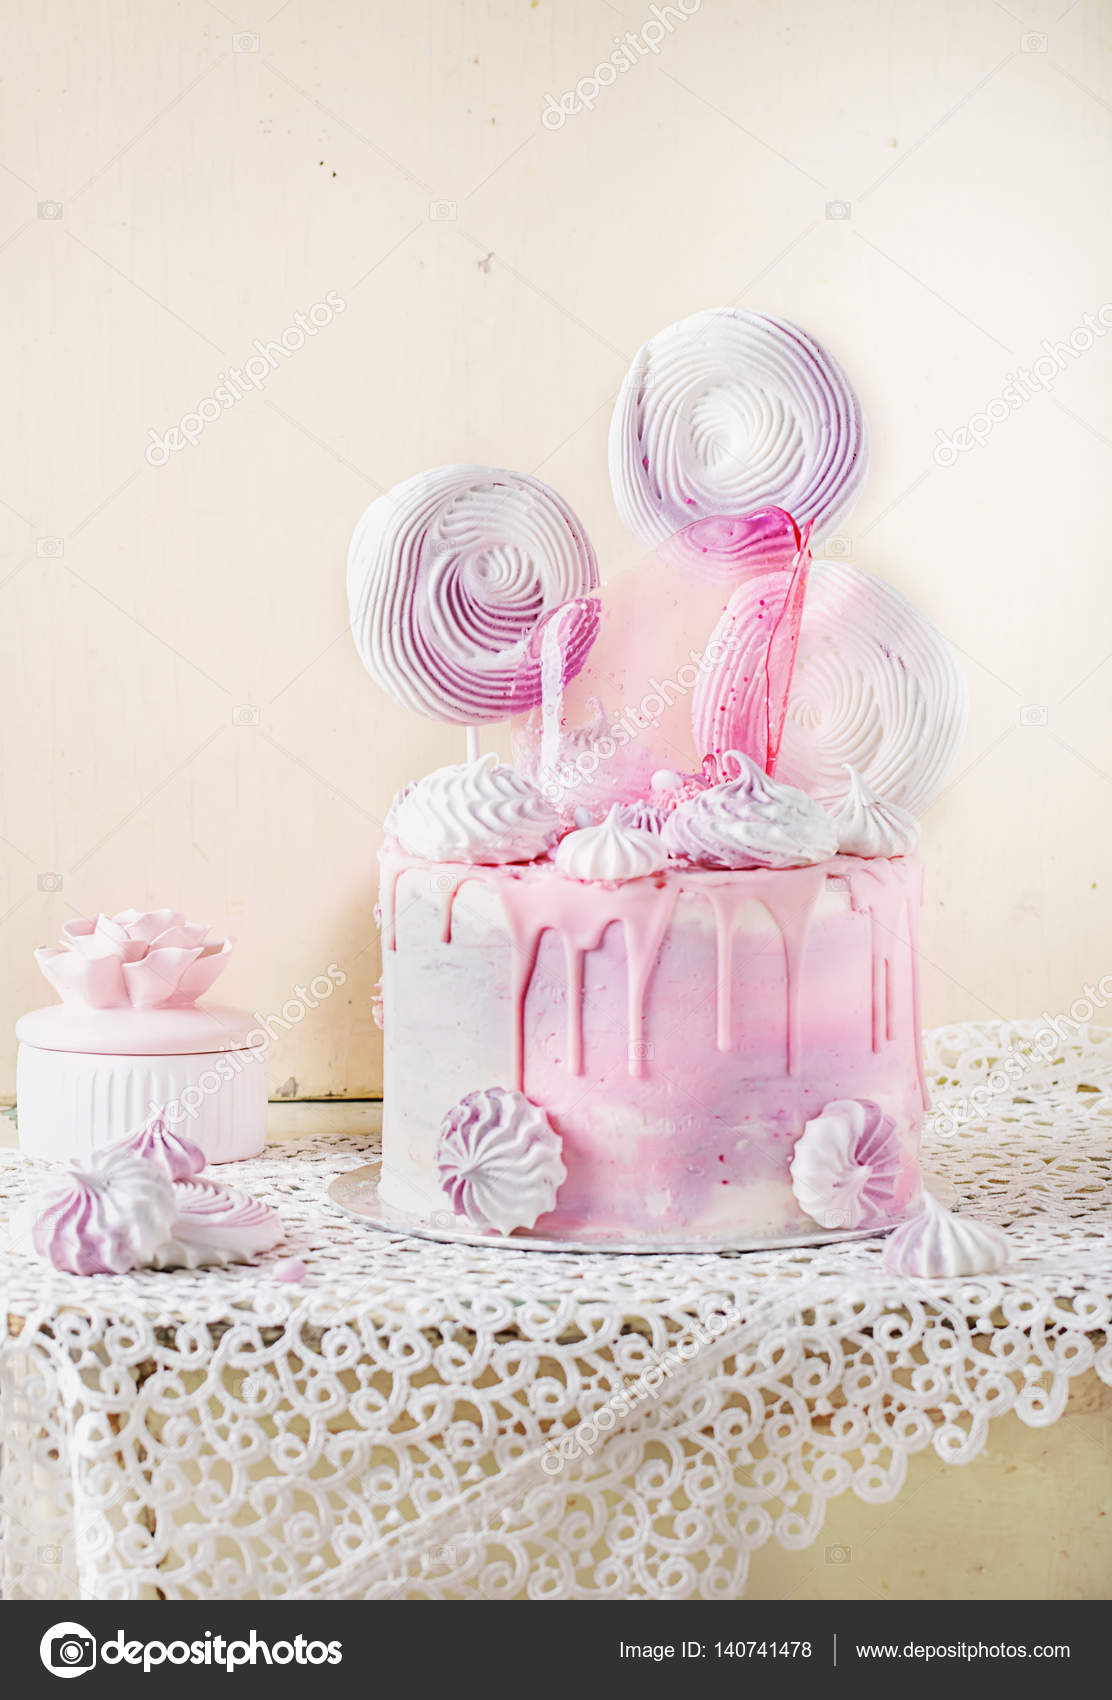 Prime Pink And Violet Fancy Birthday Cake Stock Photo C Teelesswonder Funny Birthday Cards Online Alyptdamsfinfo